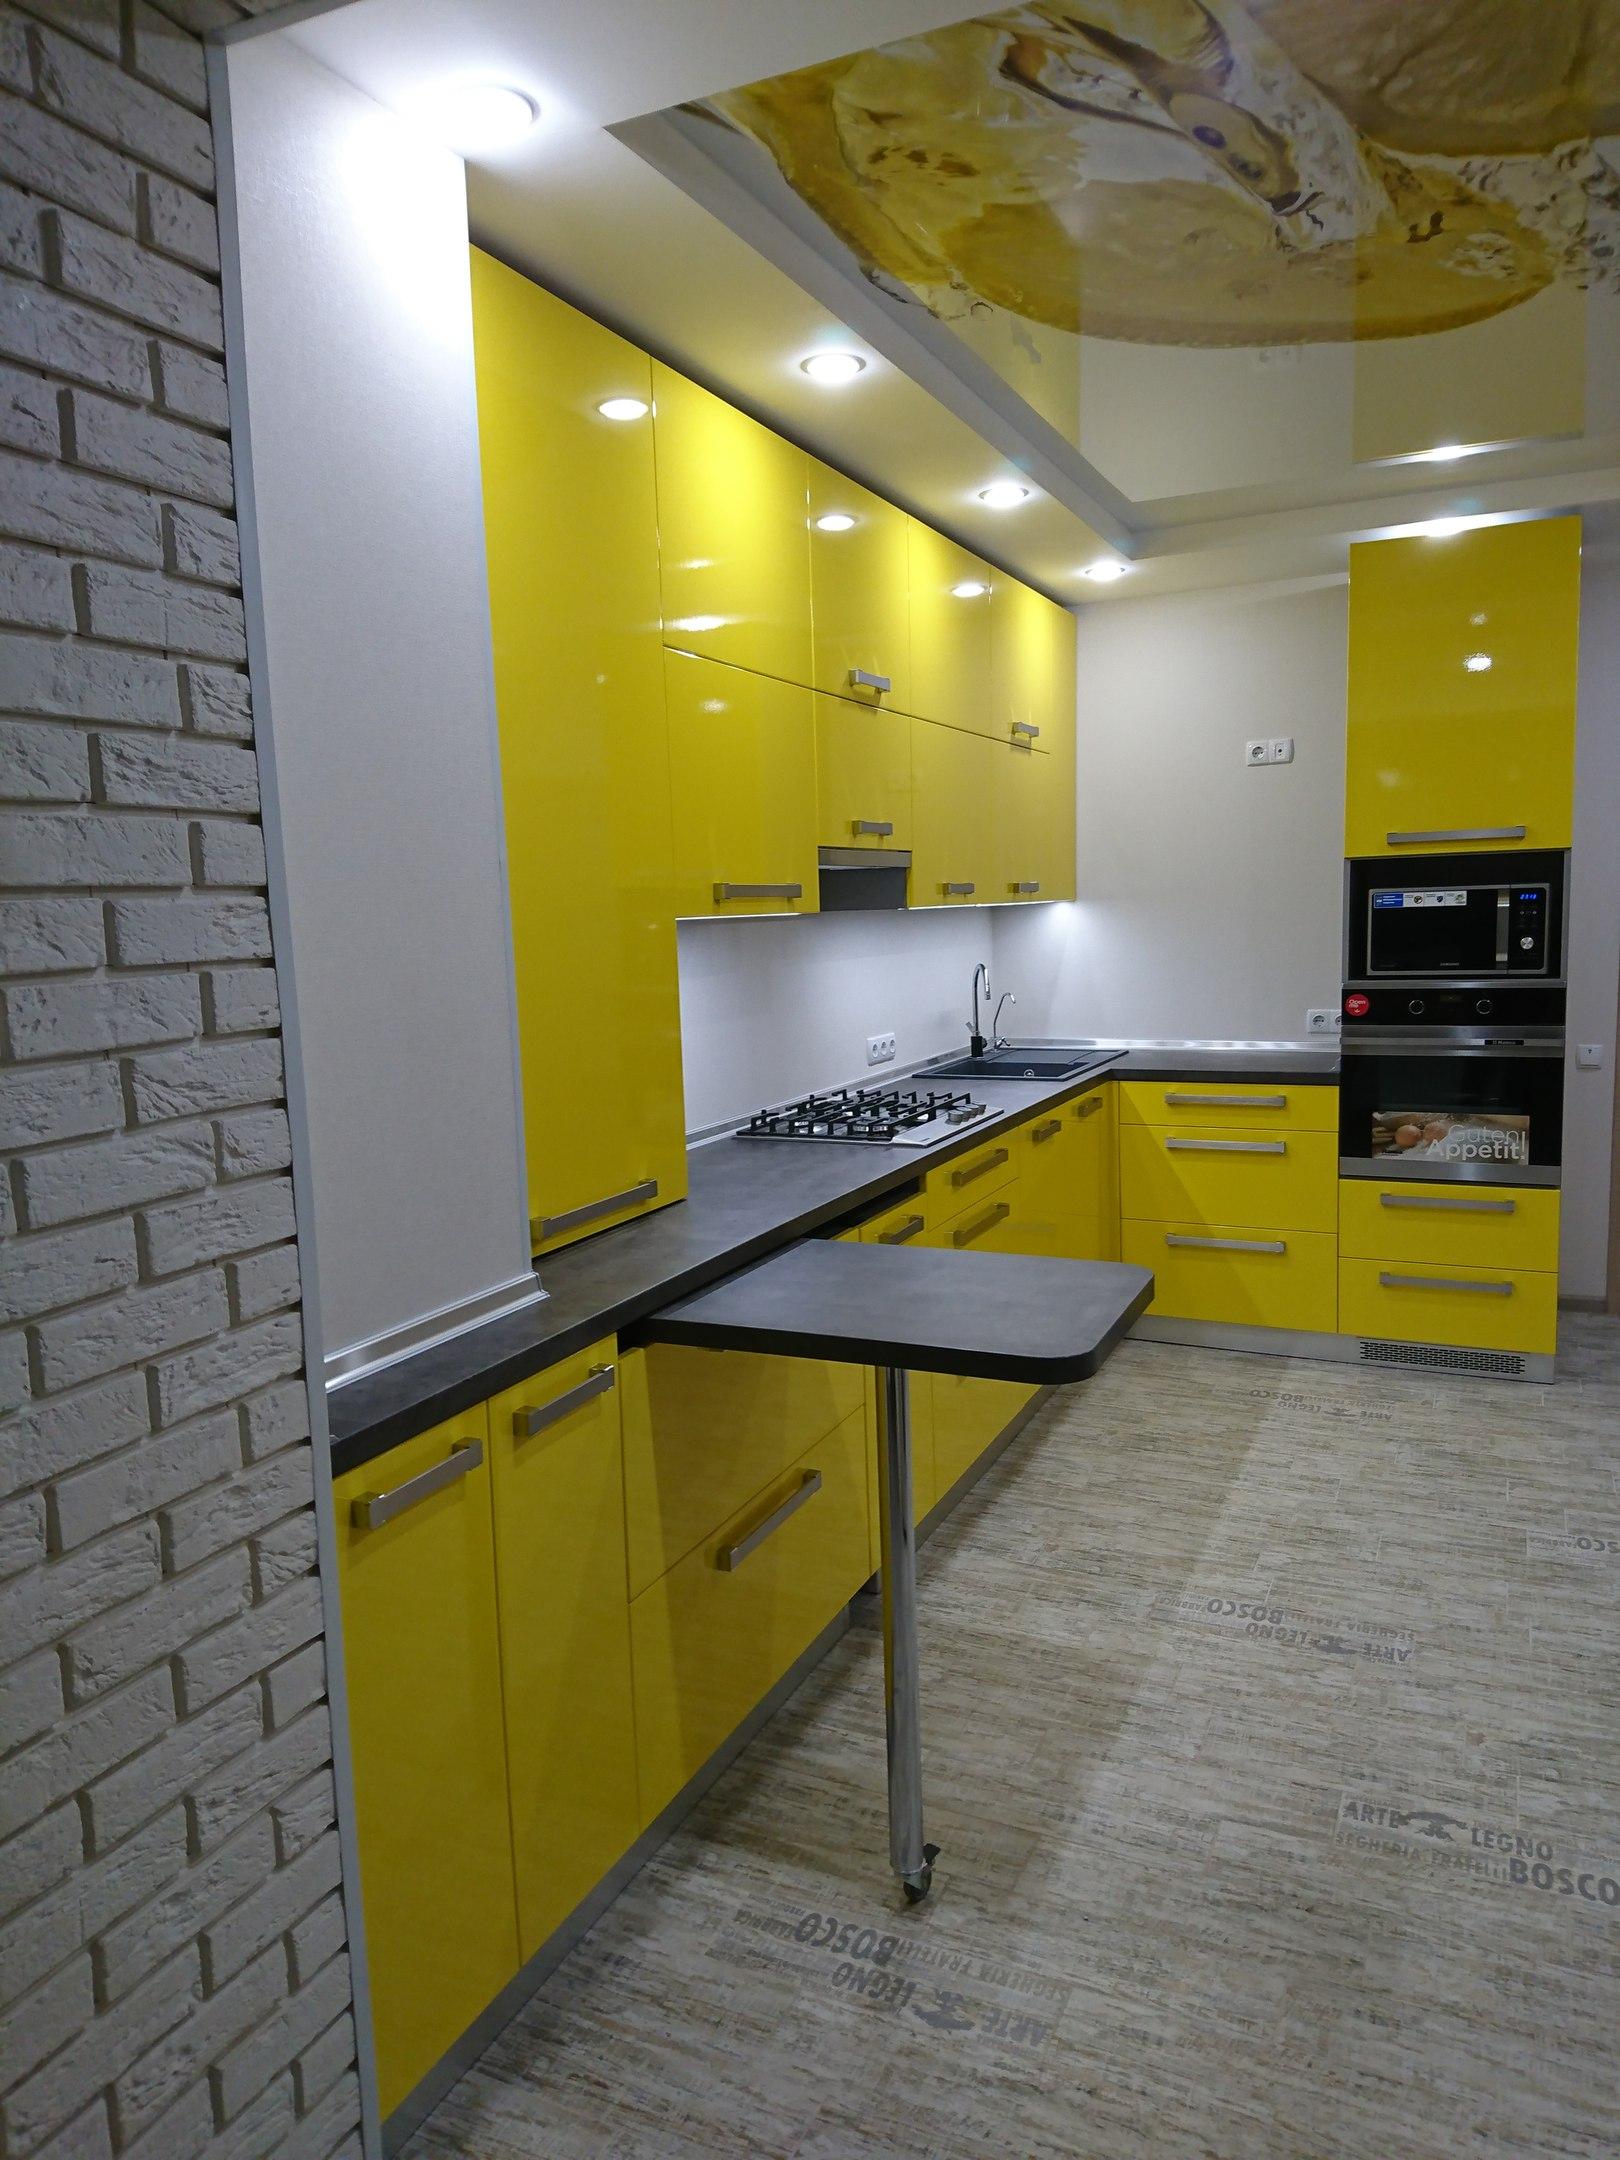 Фото Сборка кухонь под заказ 1